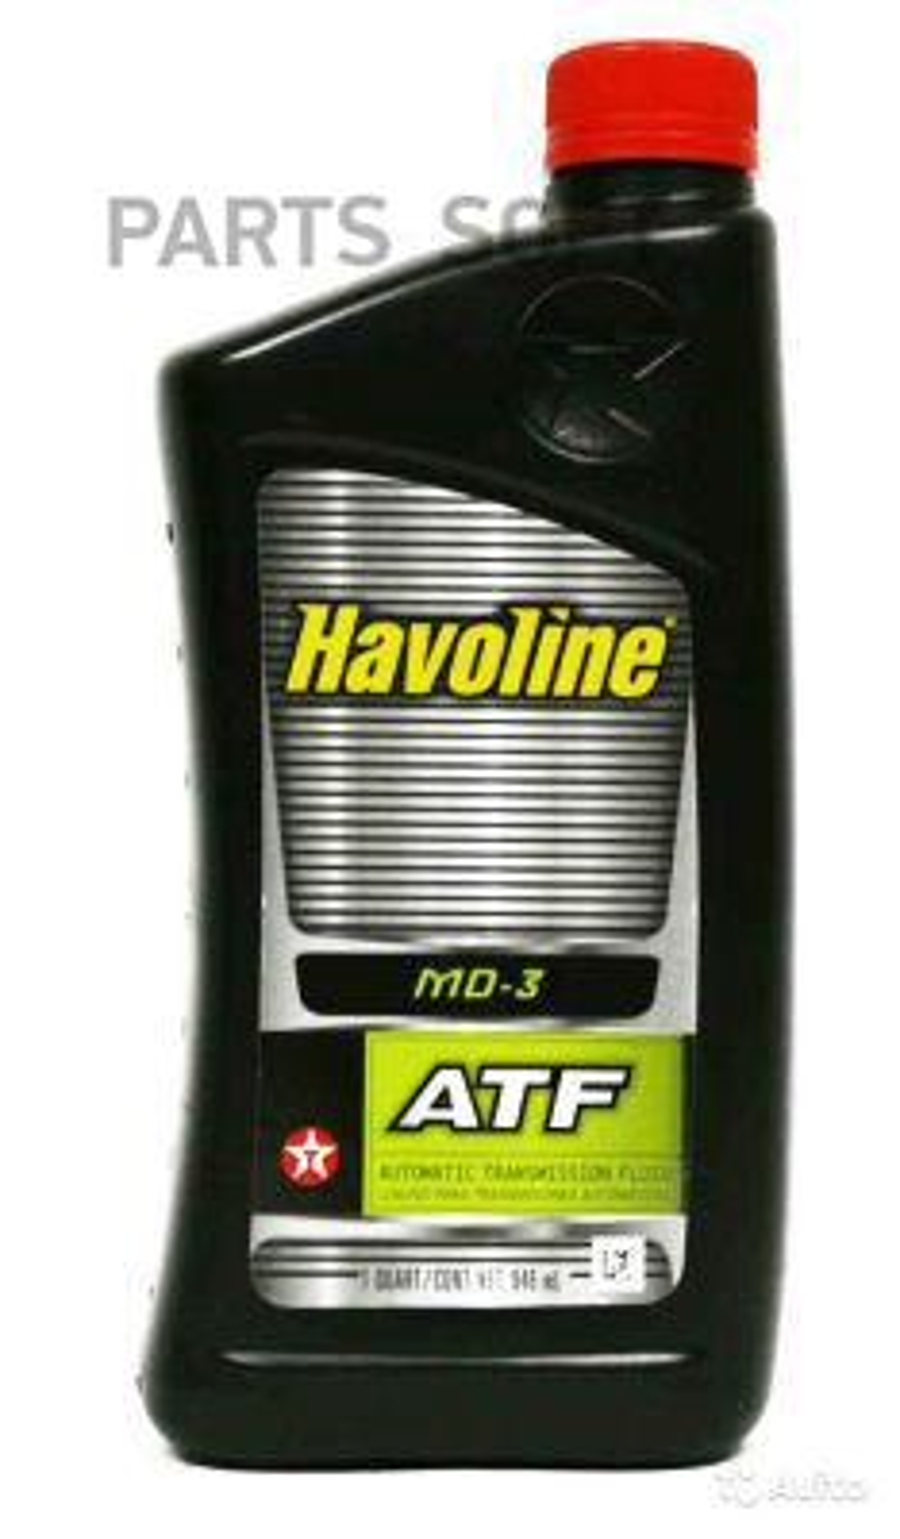 CHEVRON Havoline® ATF MD-3 0.946л